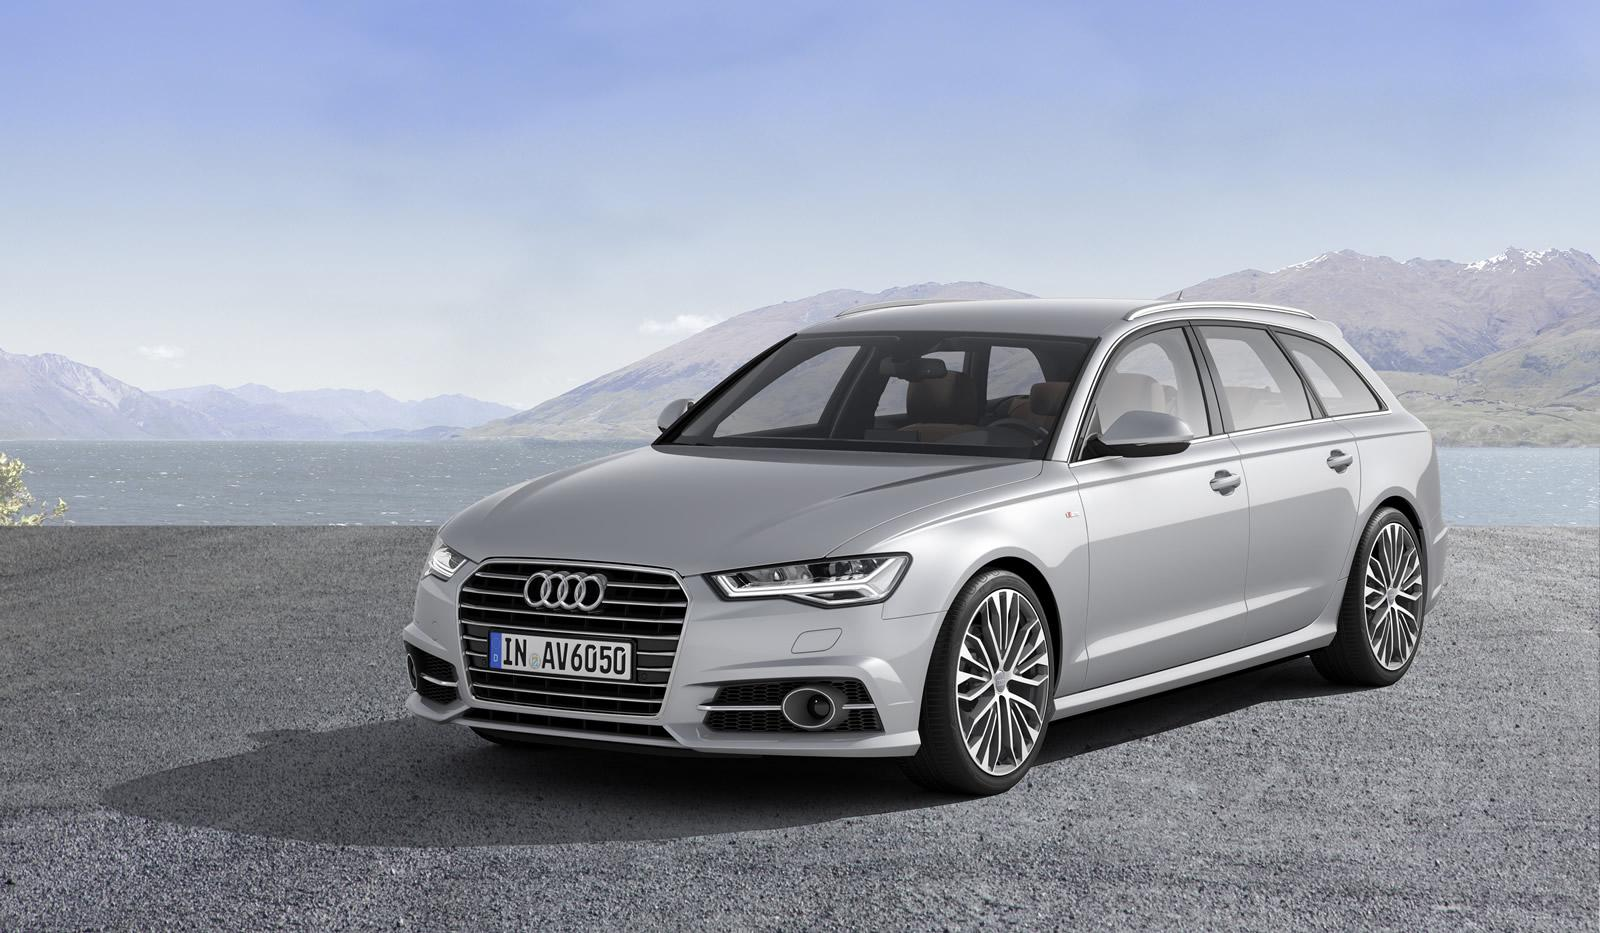 2015 Audi A6 Facelift Makes Video Debut In Avant Ultra